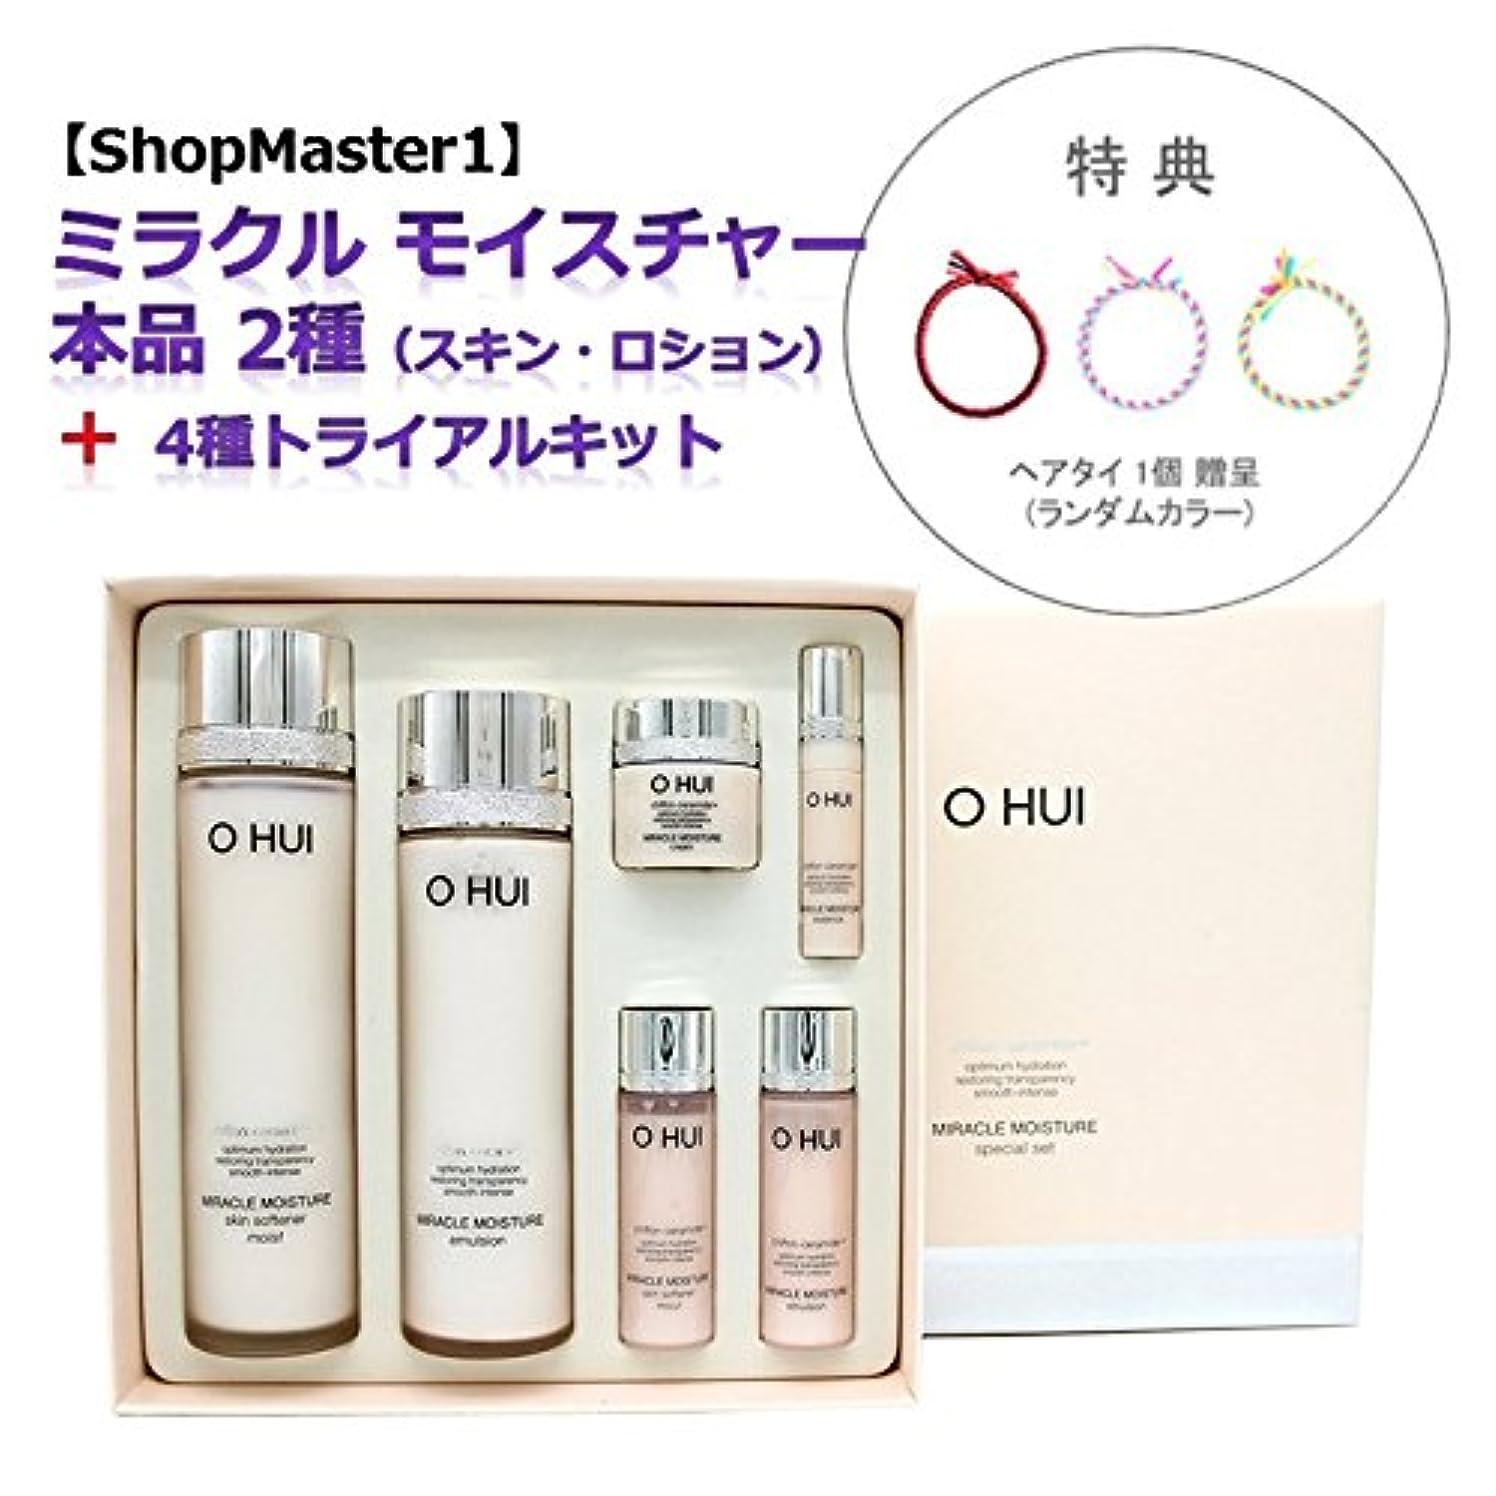 【O HUI オフィ】ミラクルモイスチャー スキン?エマルジョン + トライイアルキット 4種 / Miracle Moisture Skin?Emulsion + Trial Kit 4Pcs / 海外直送品 / 特典...